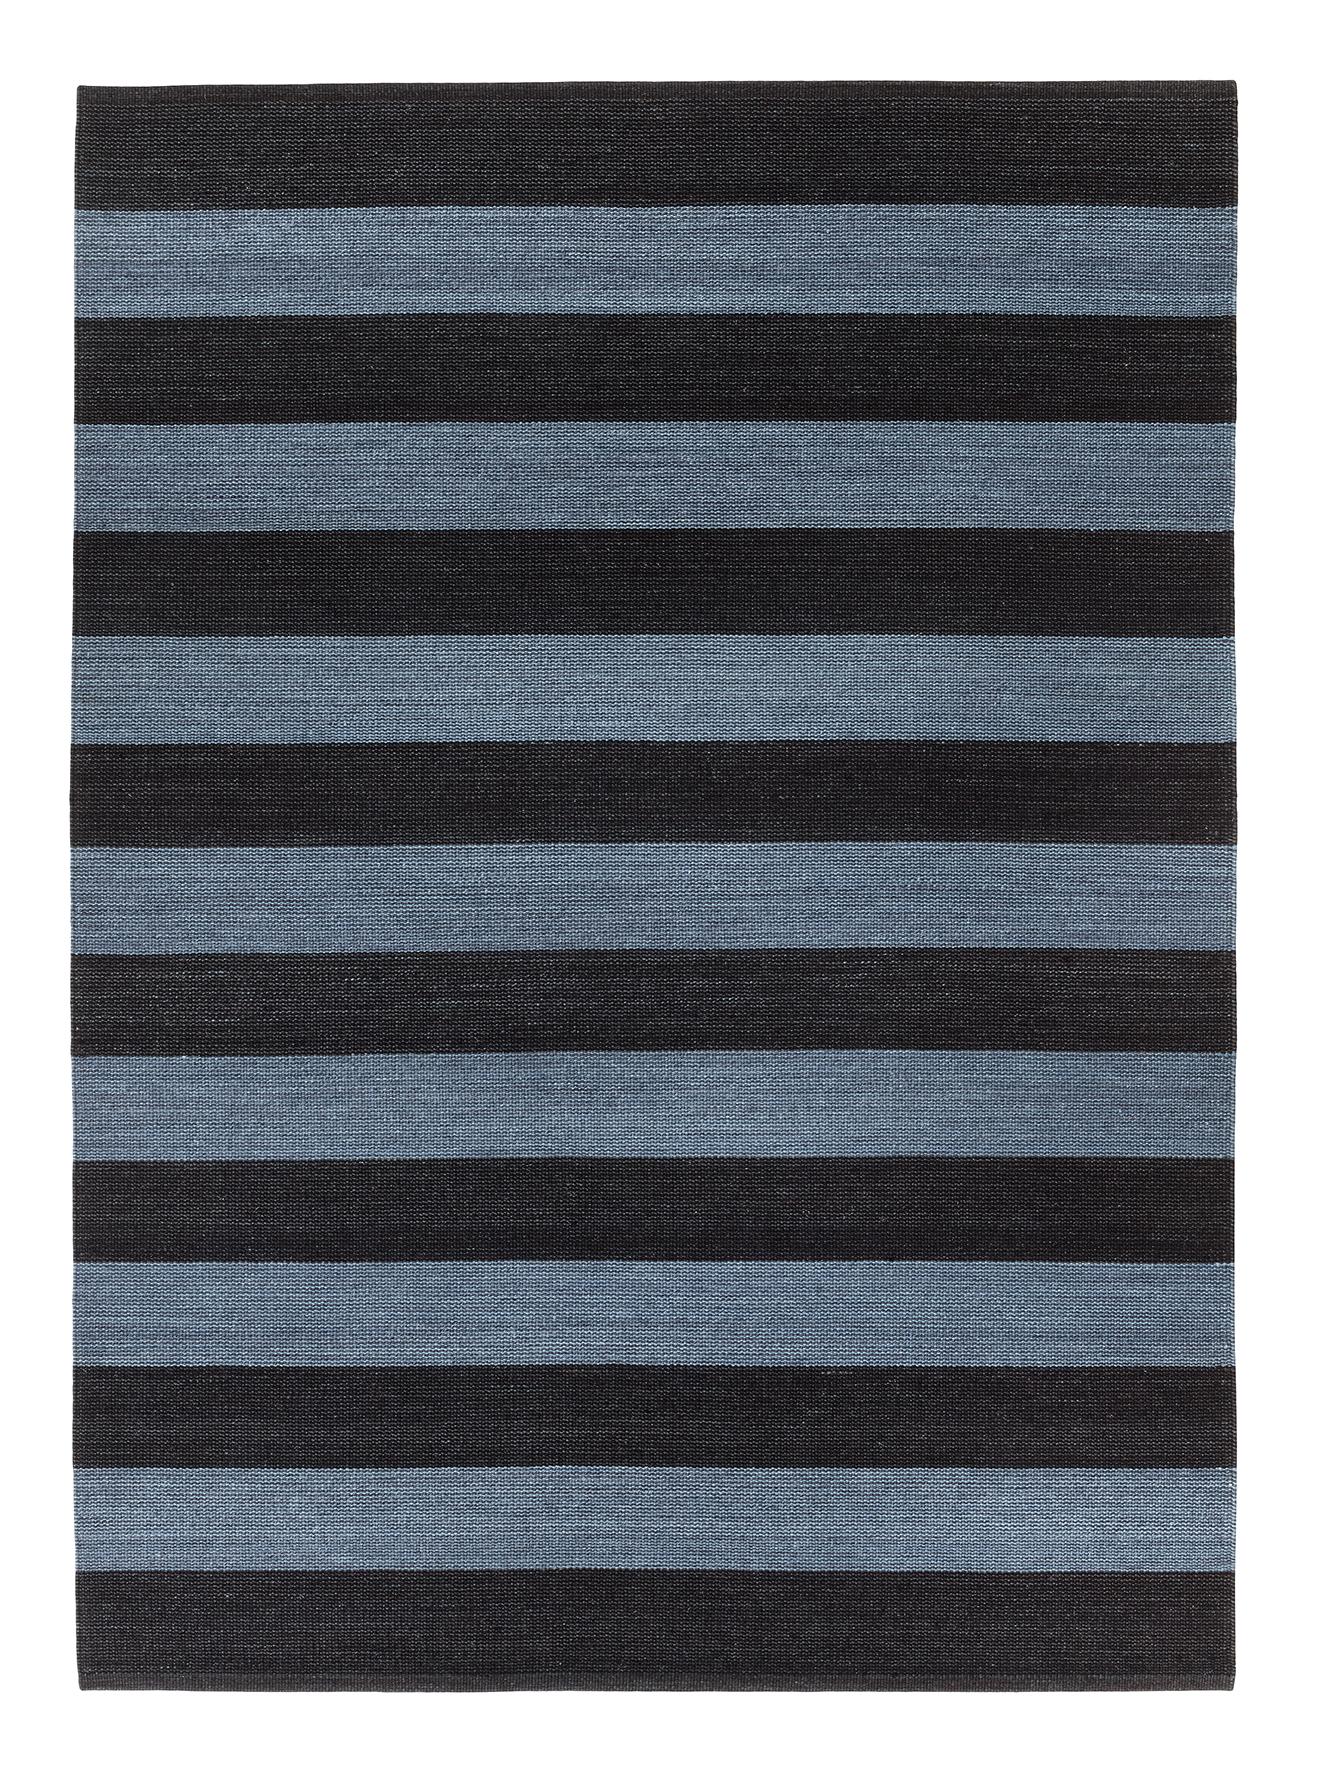 Iris 1517 Black/Blue